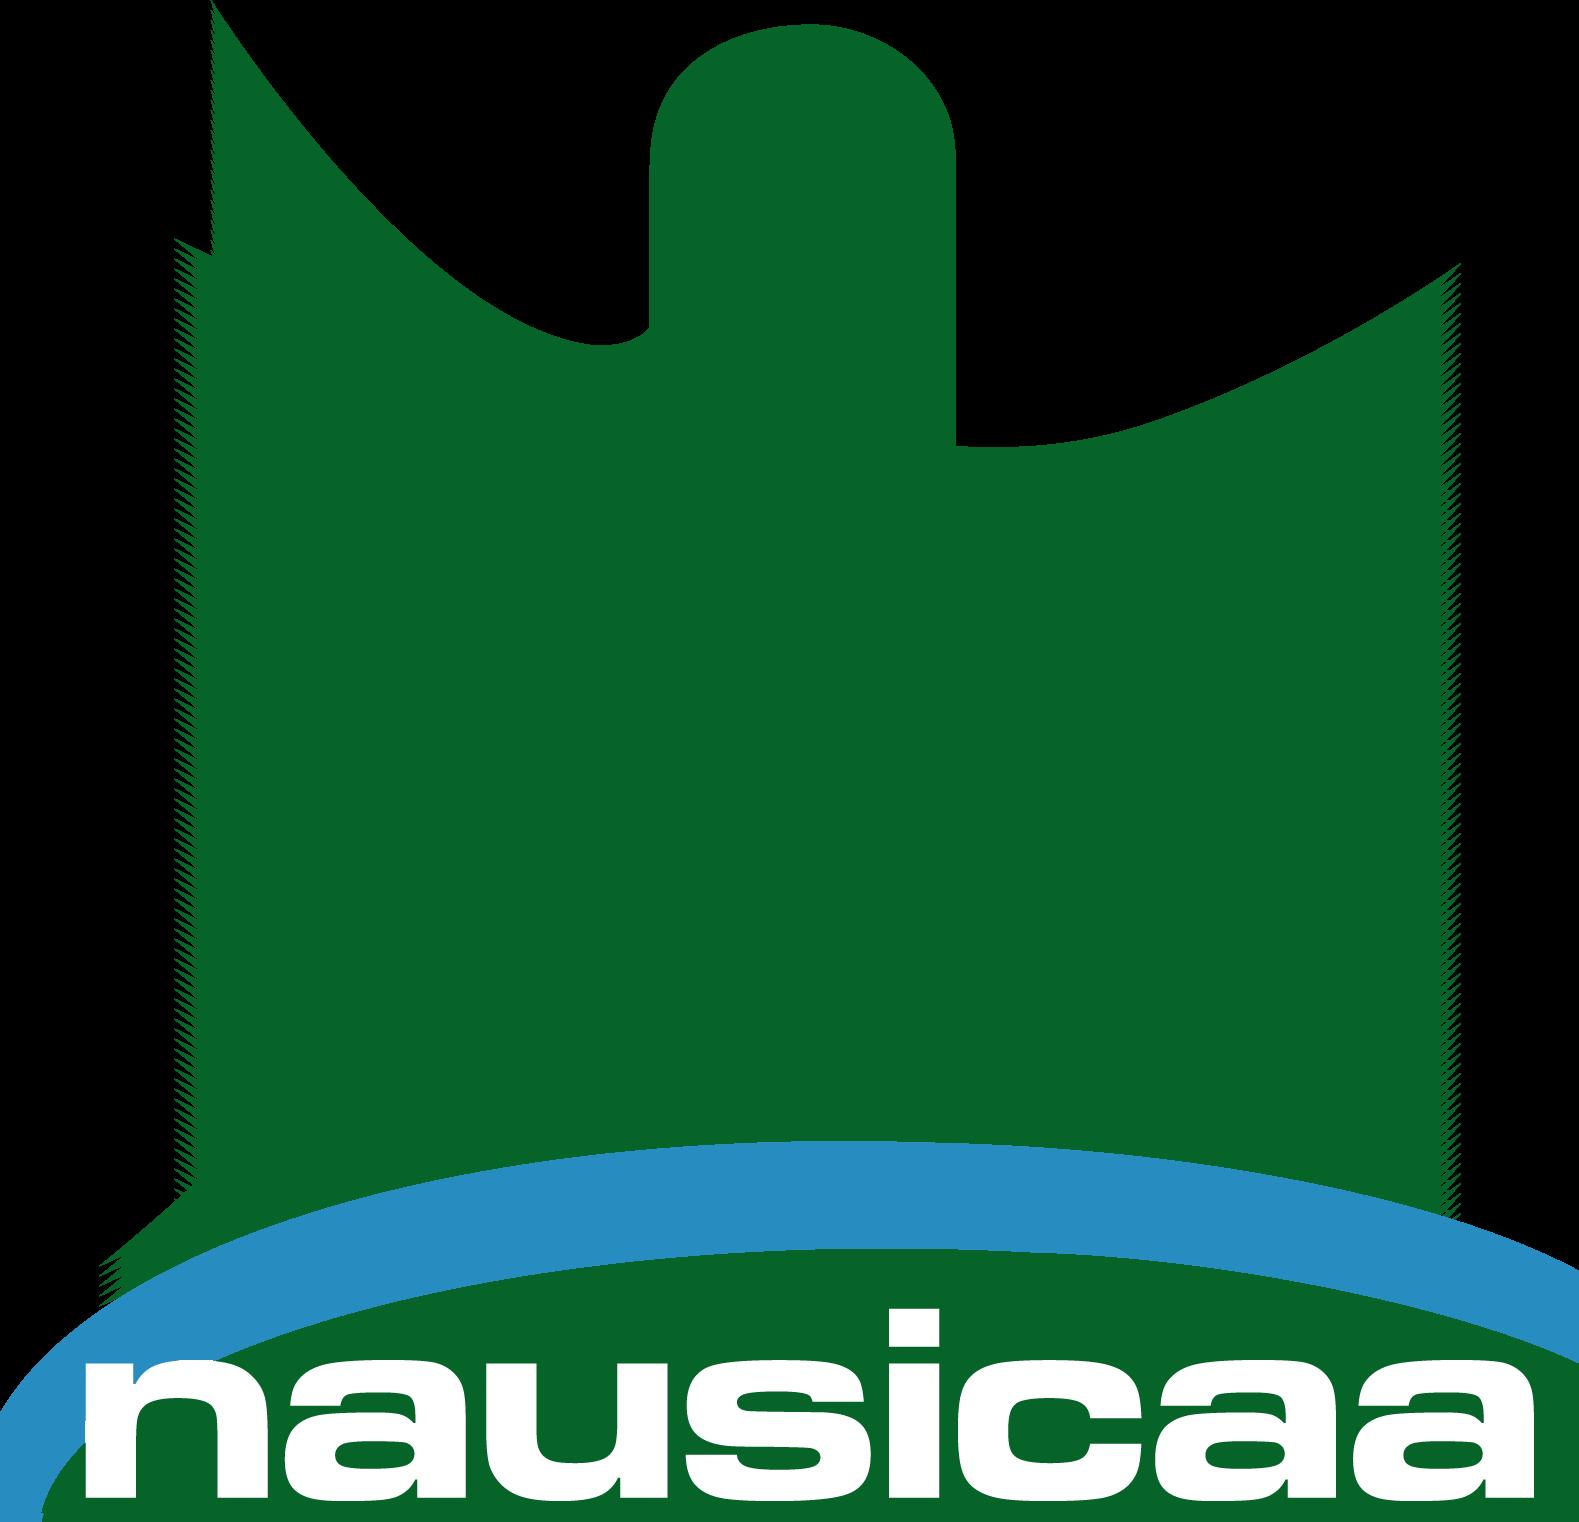 Nausicaa S.p.a